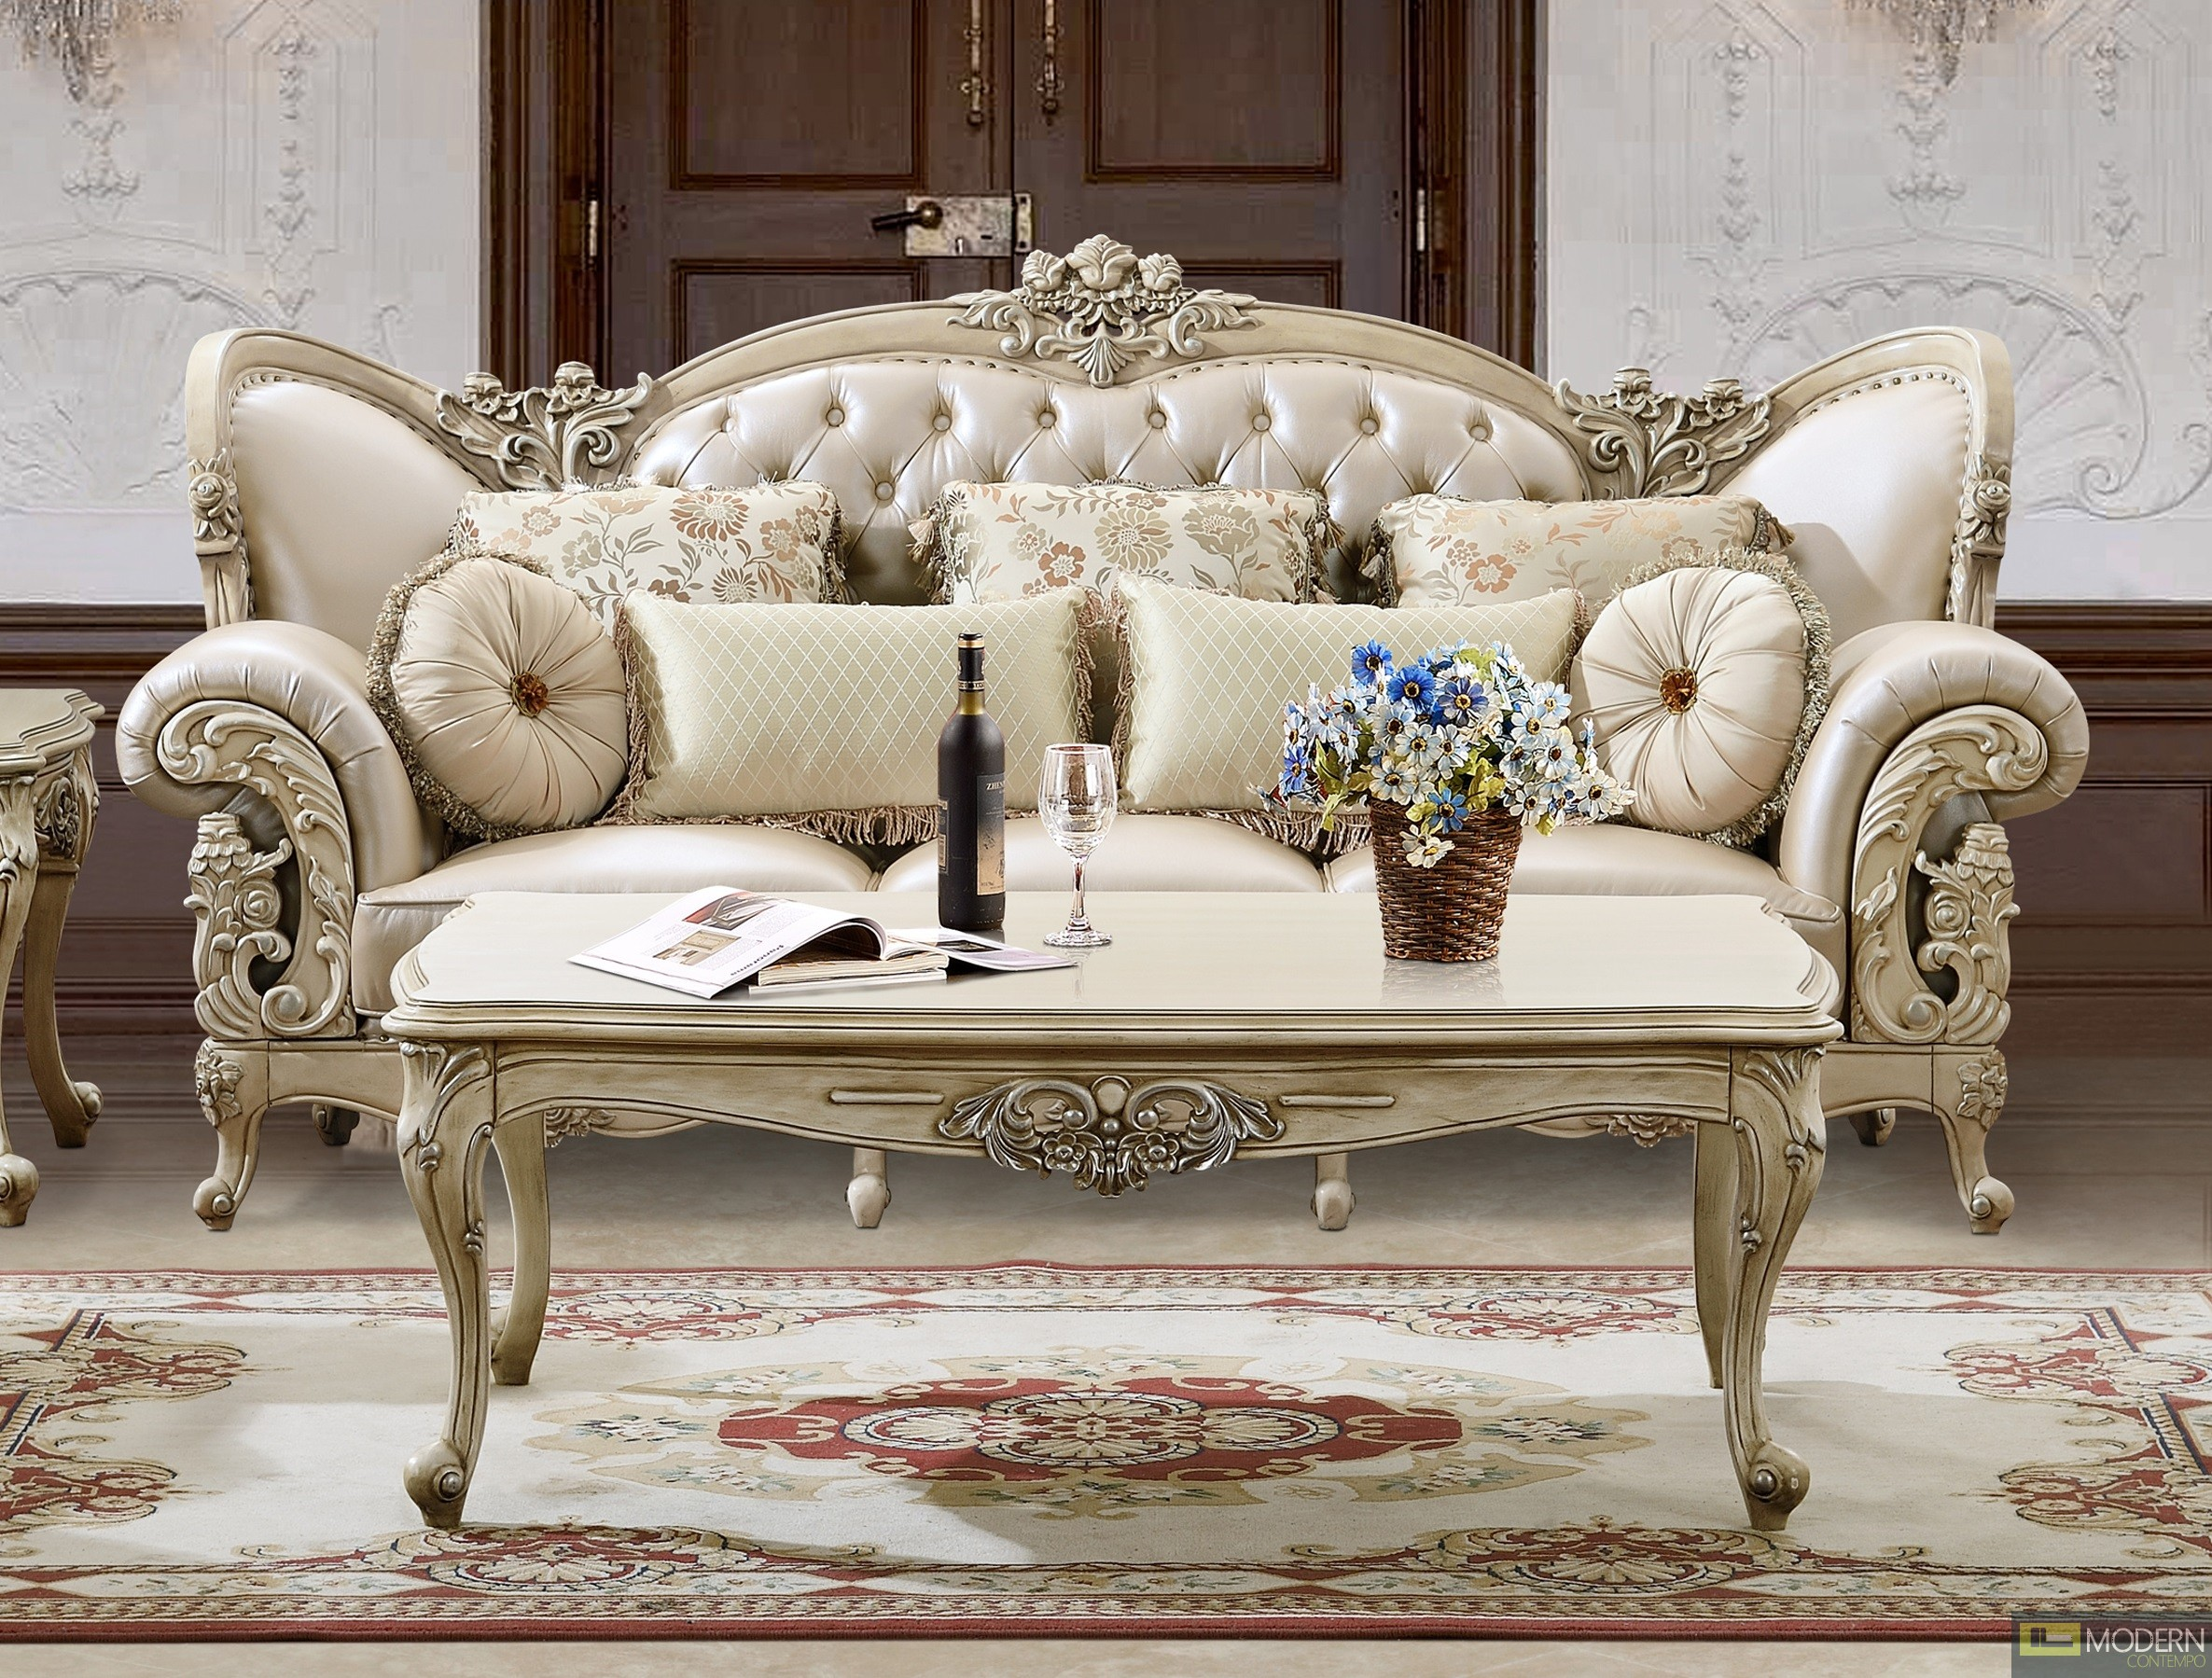 Azalea upholstery living room set Victorian European & Classic